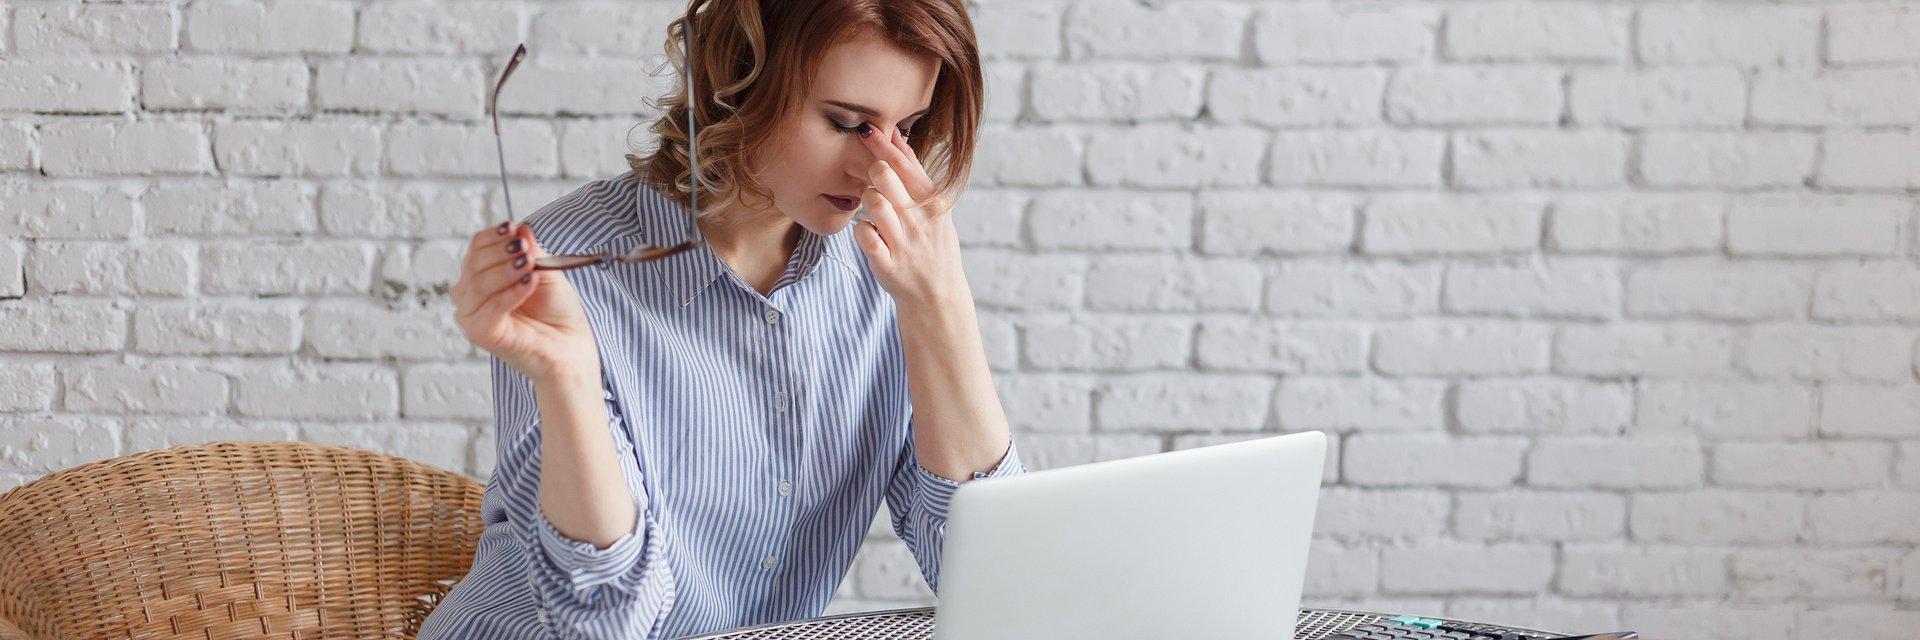 Prevent Computer Eye Strain